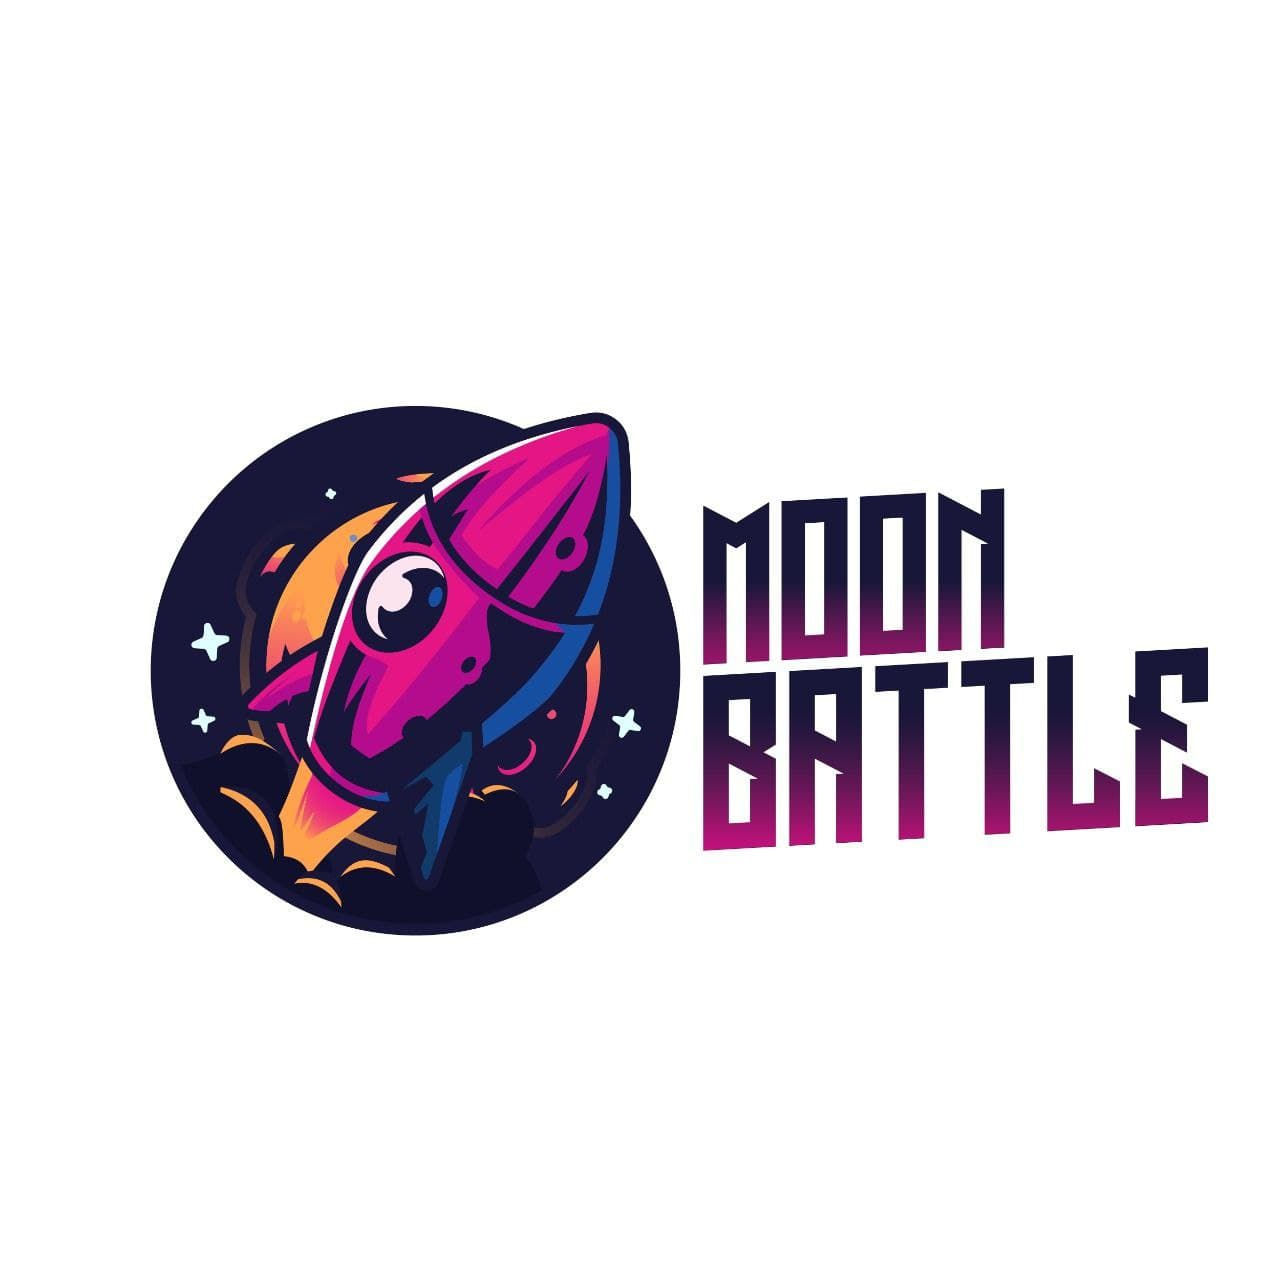 Moon Battle logo